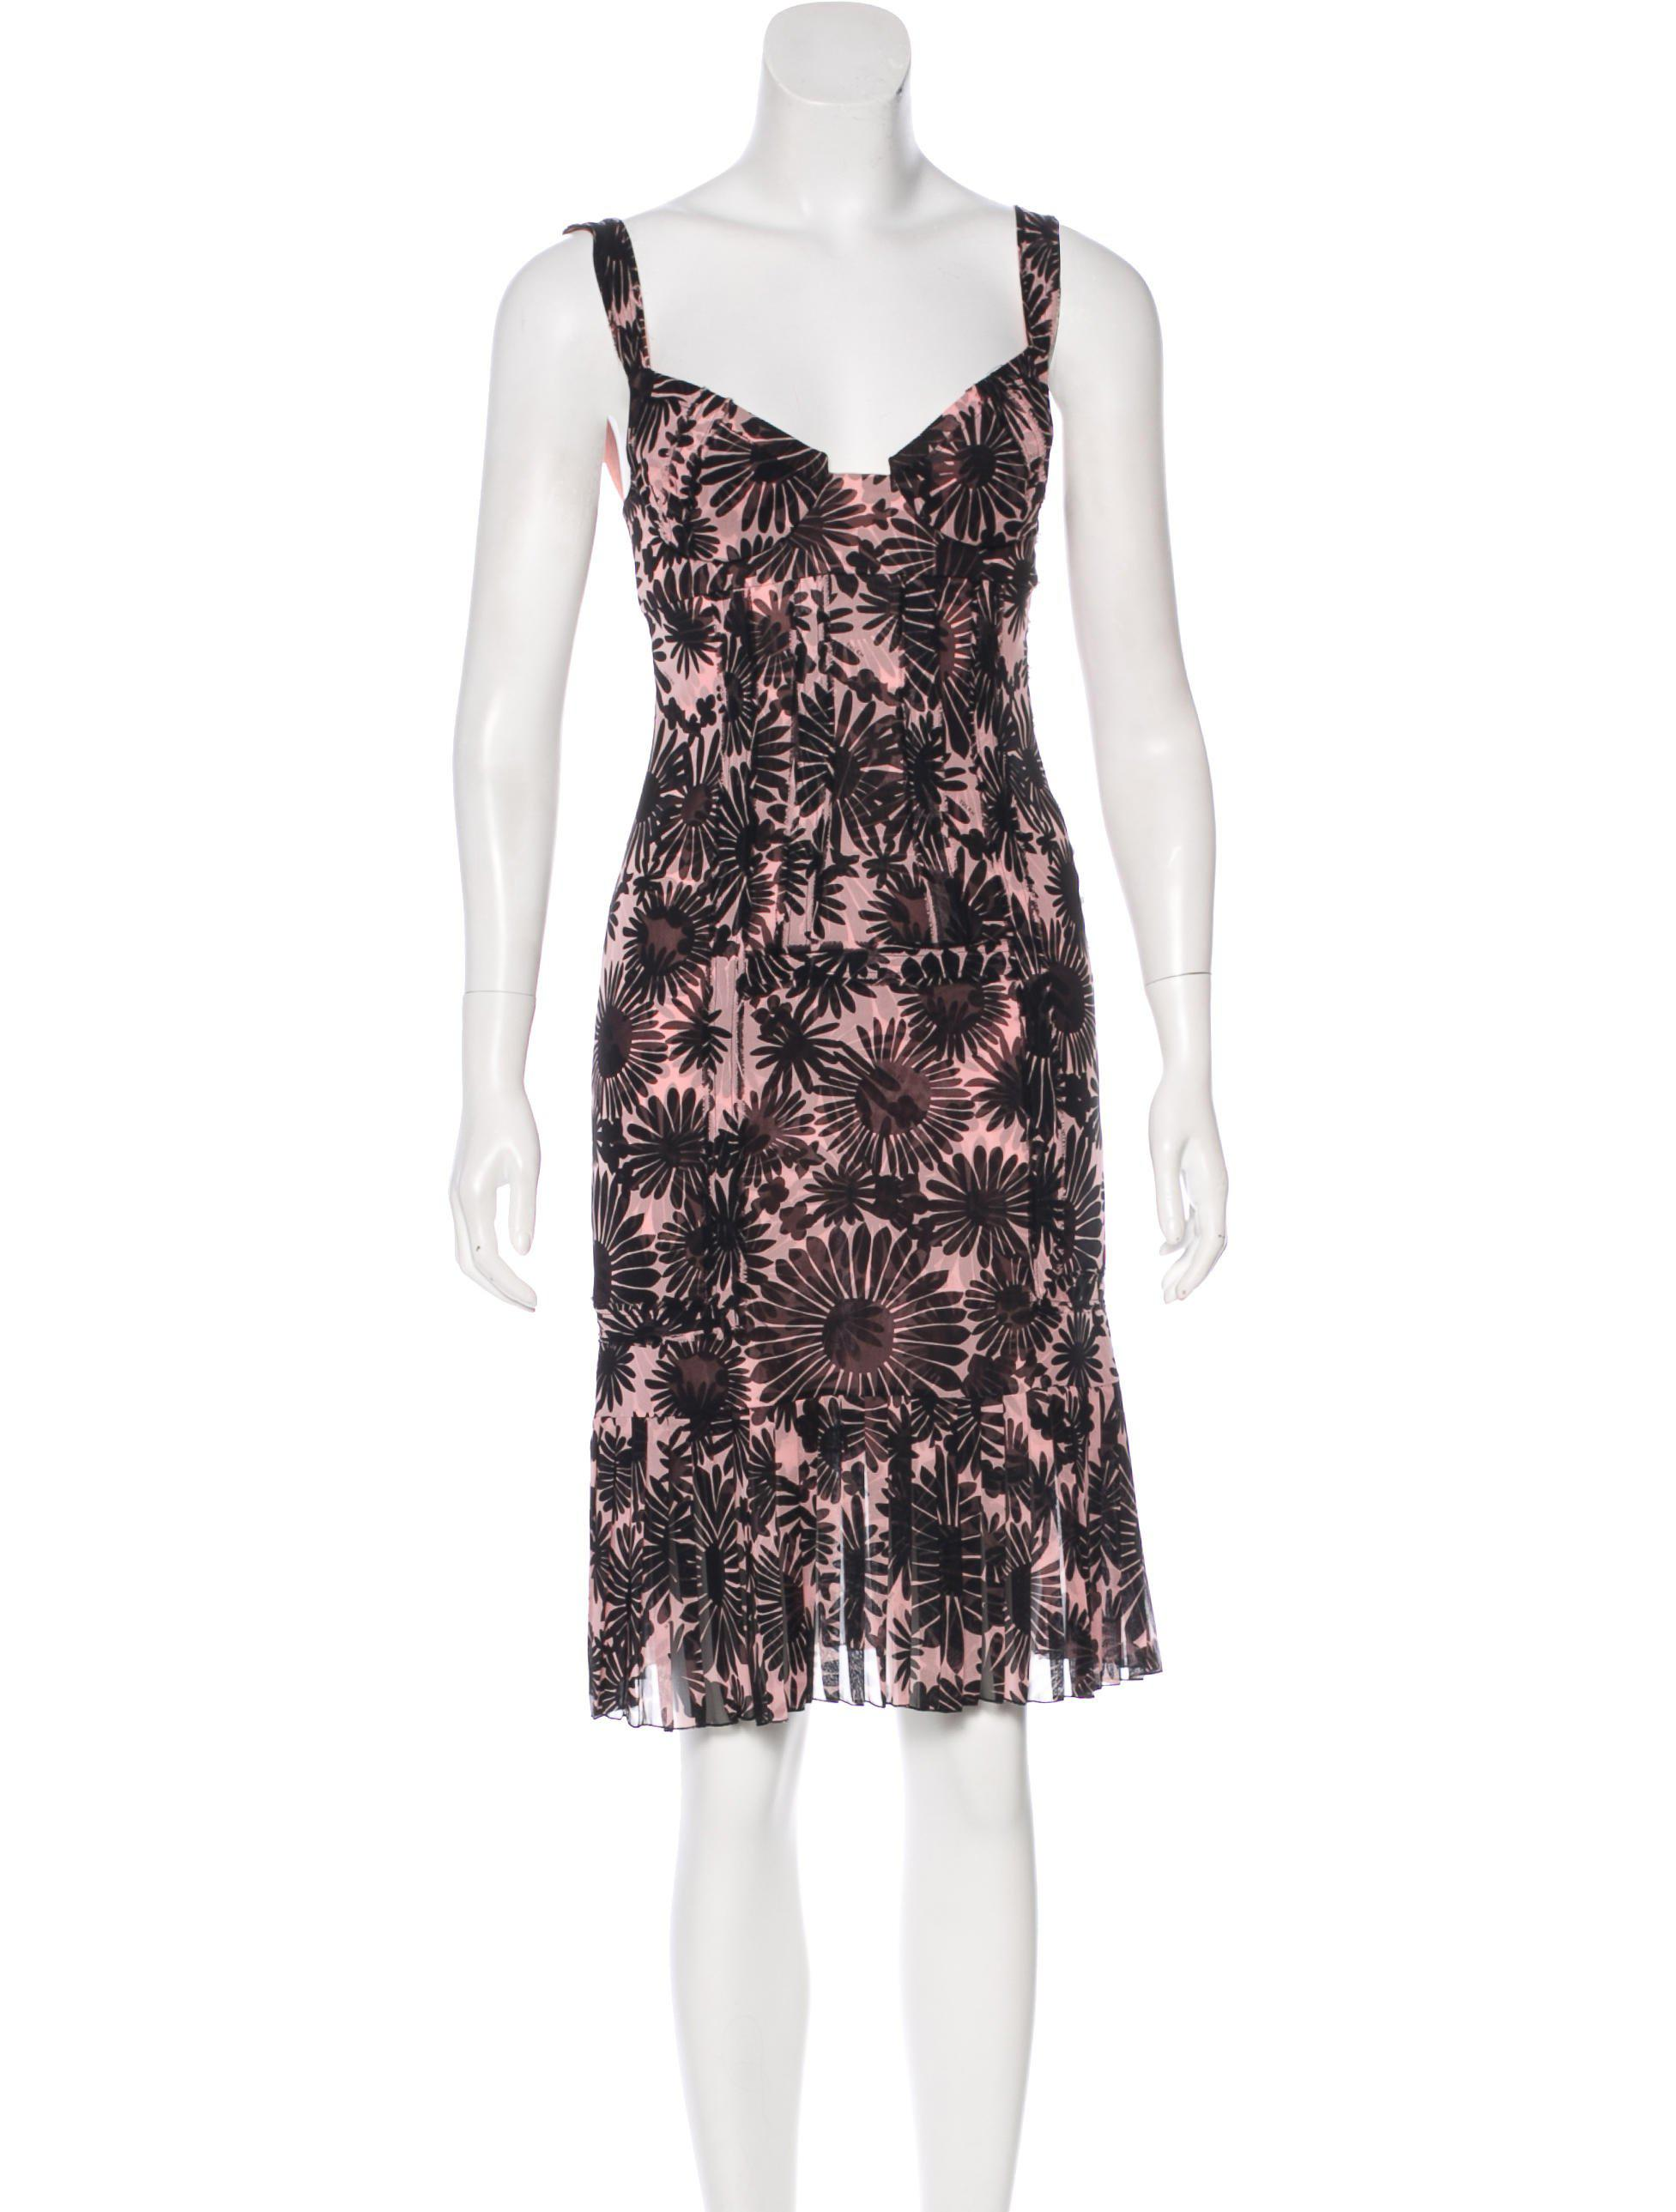 Tuleh Lace Slip Dress w/ Tags Cheapest Price Cheap High Quality nIPqm